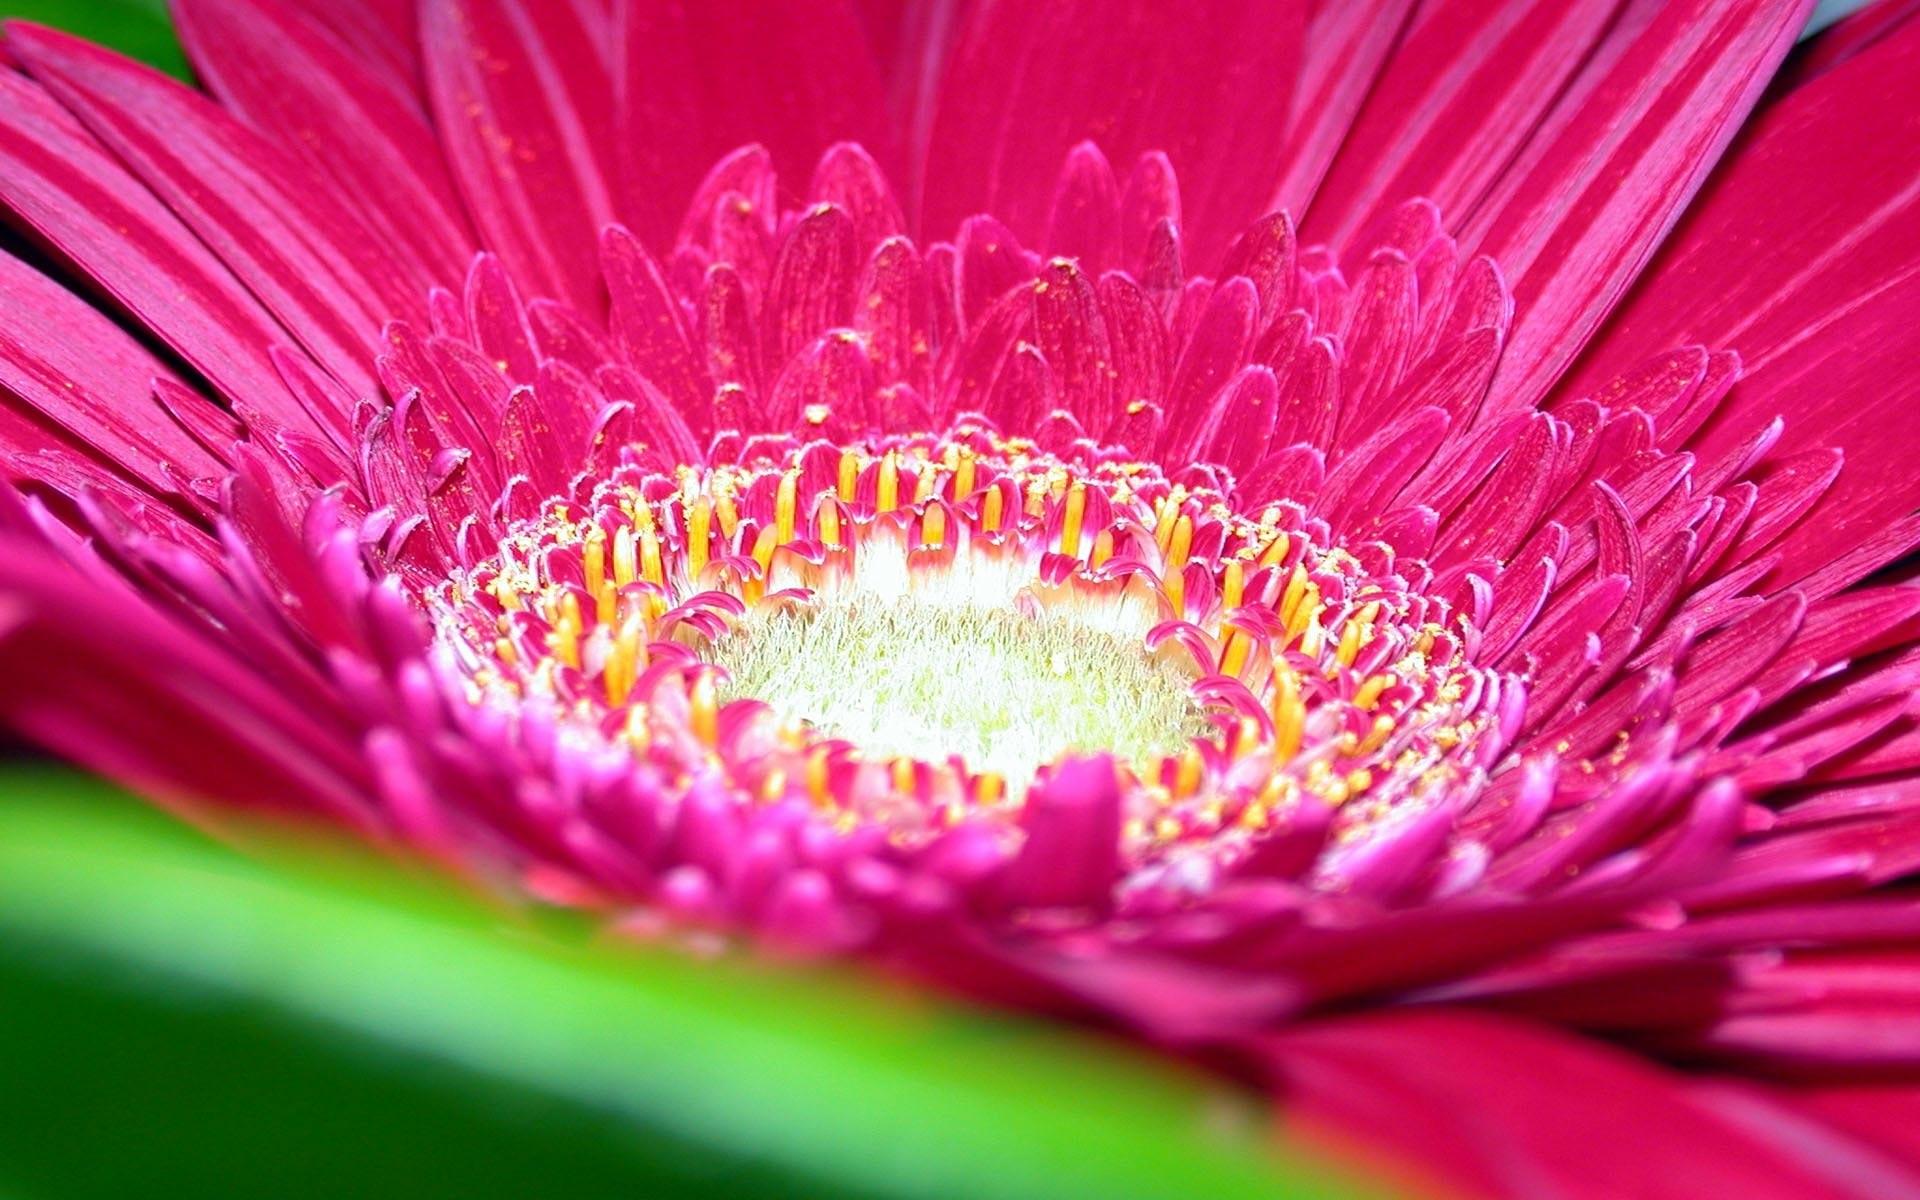 pink colour flower images